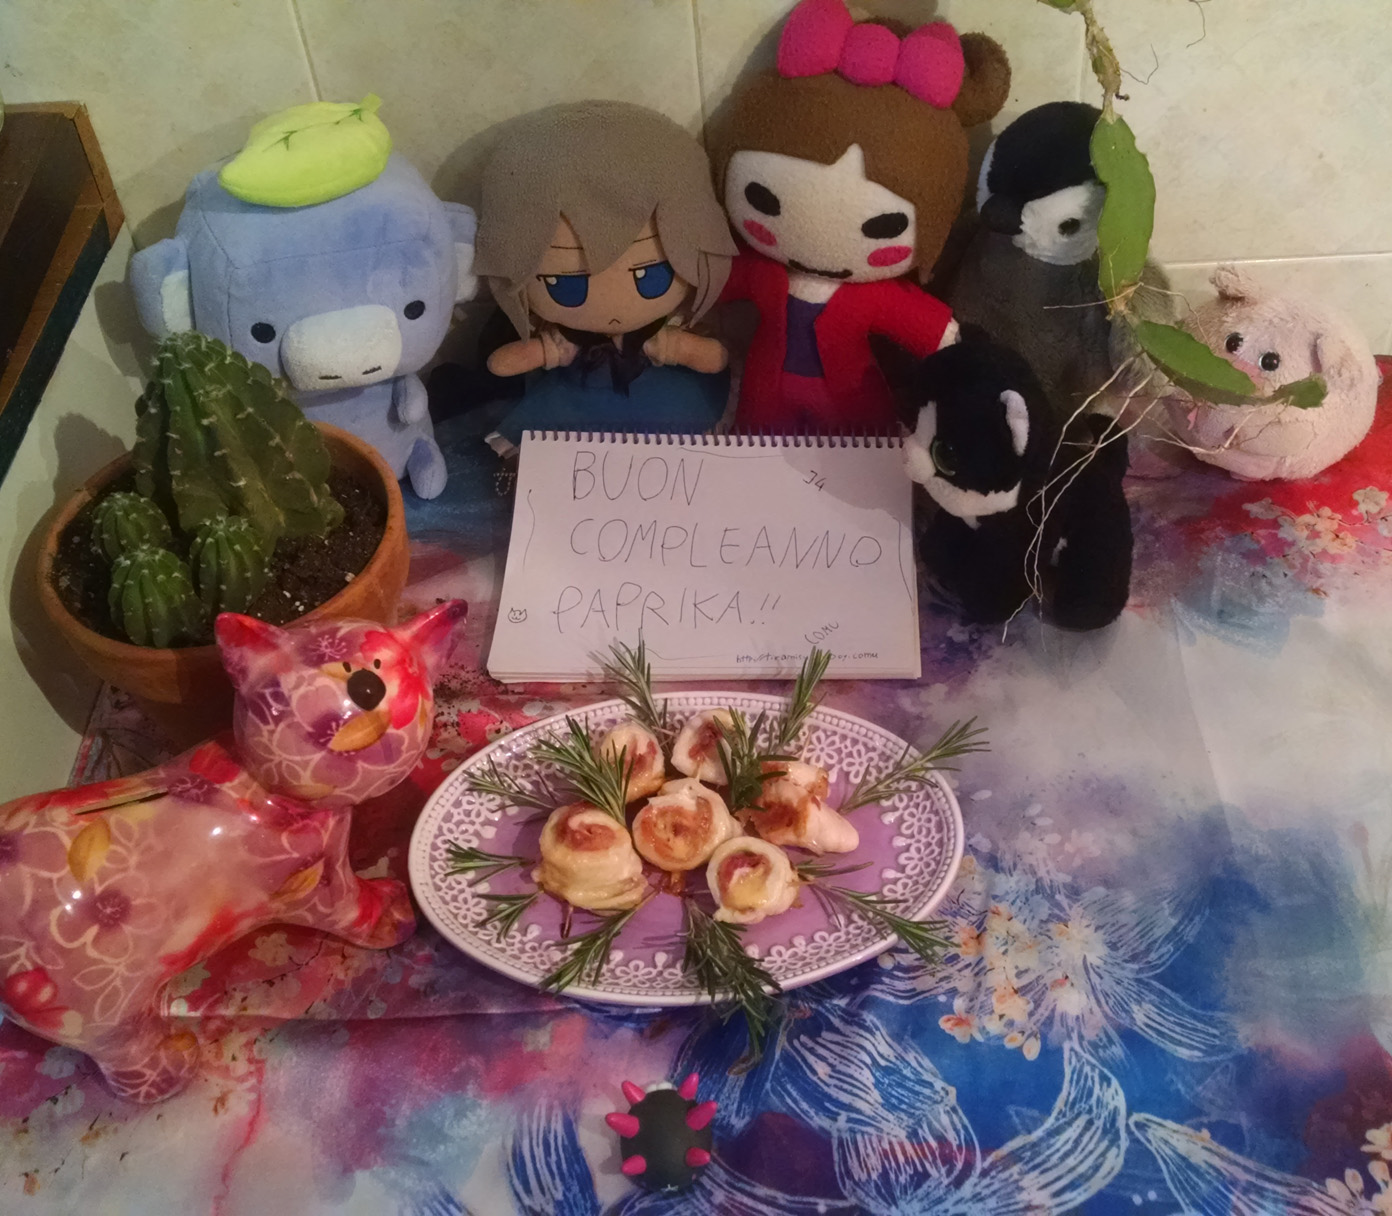 Happy birthday to Paprika! (2019)